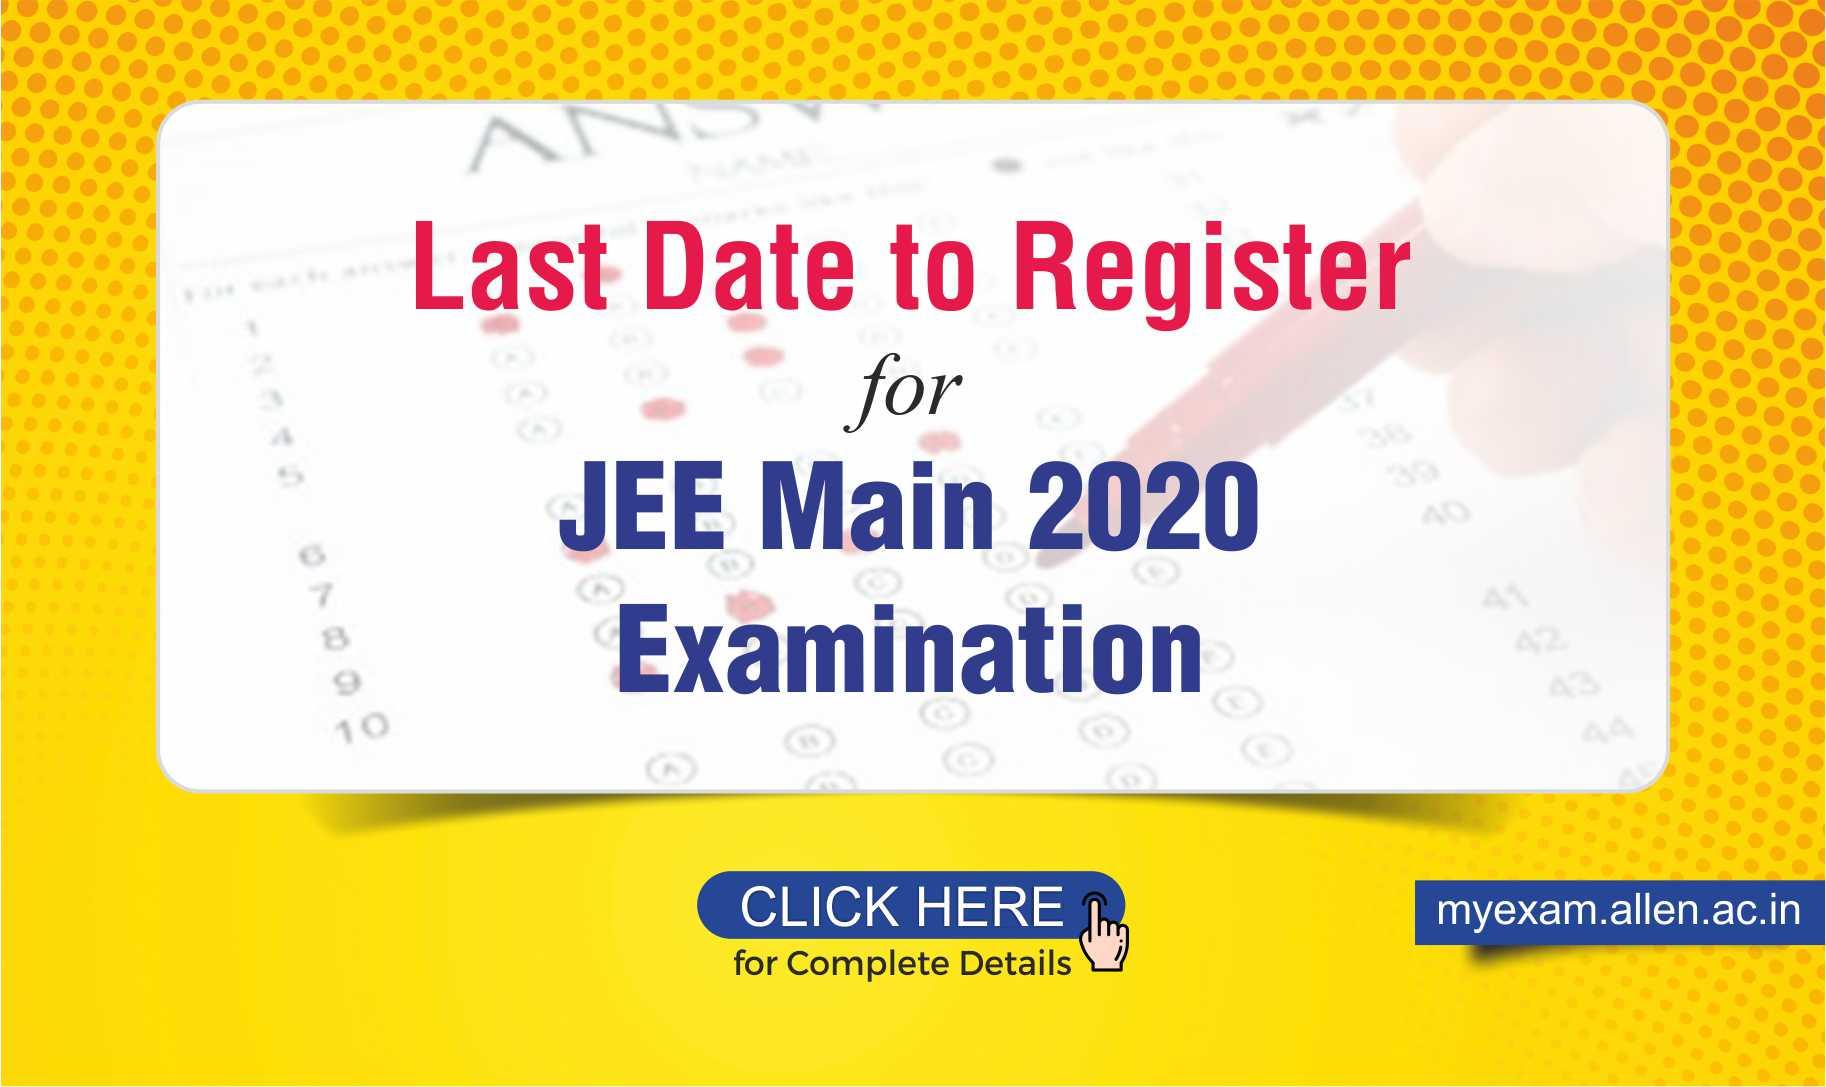 JEE Main 2020 Registration